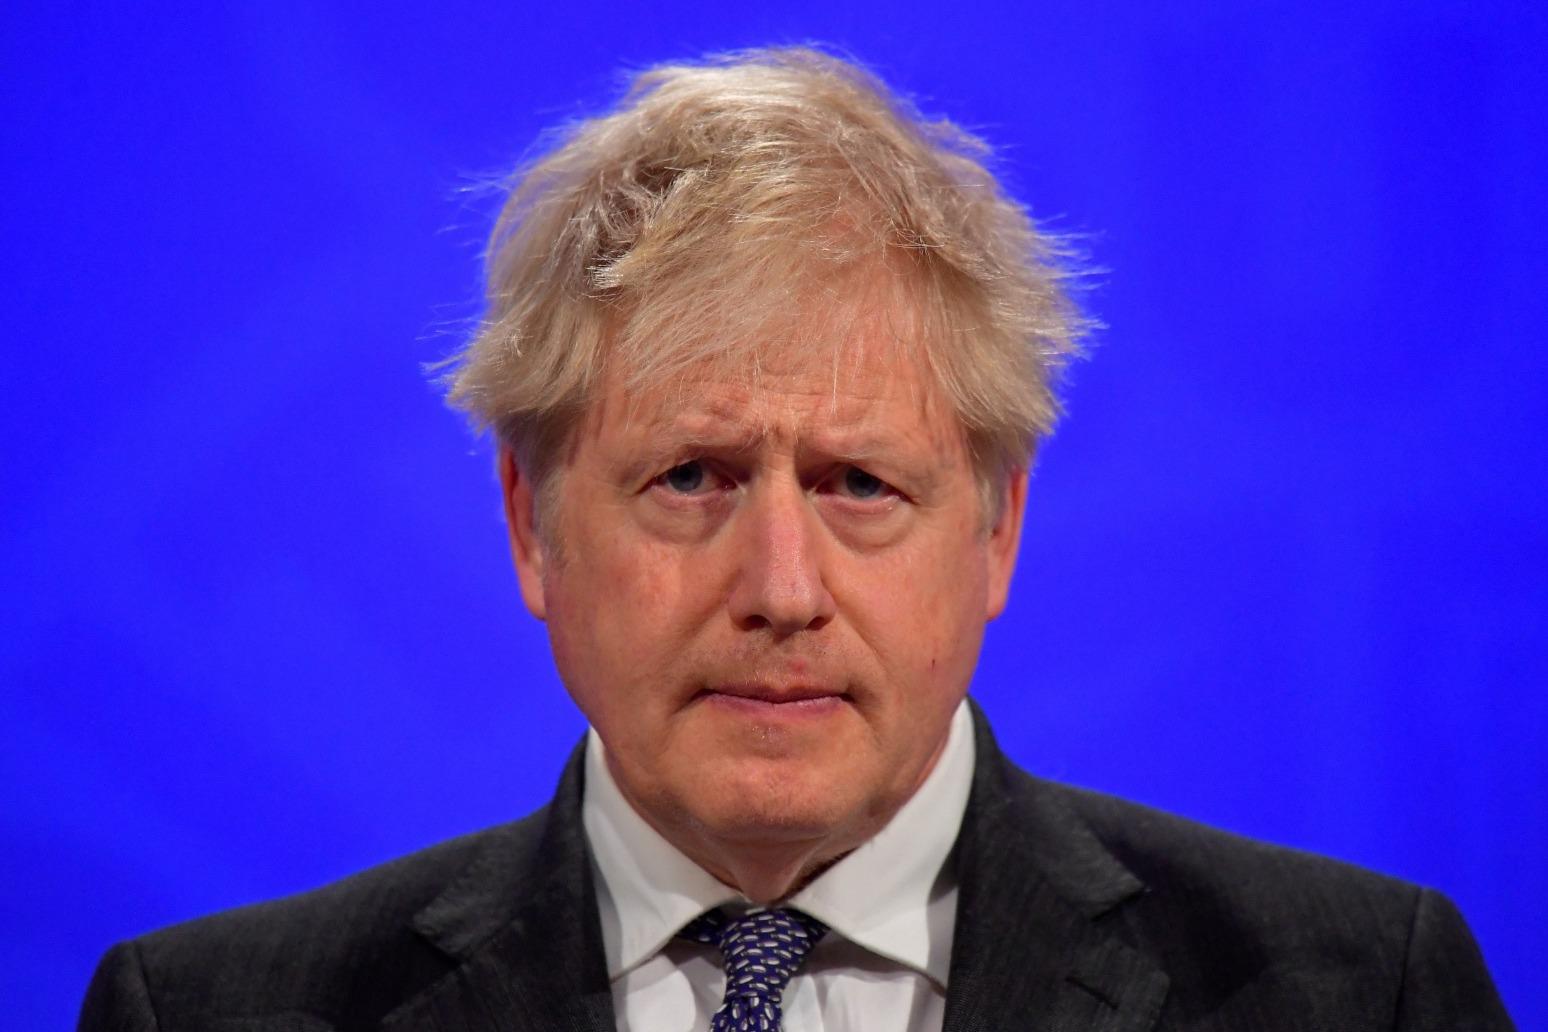 Boris Johnson facing investigation over Mustique new year getaway